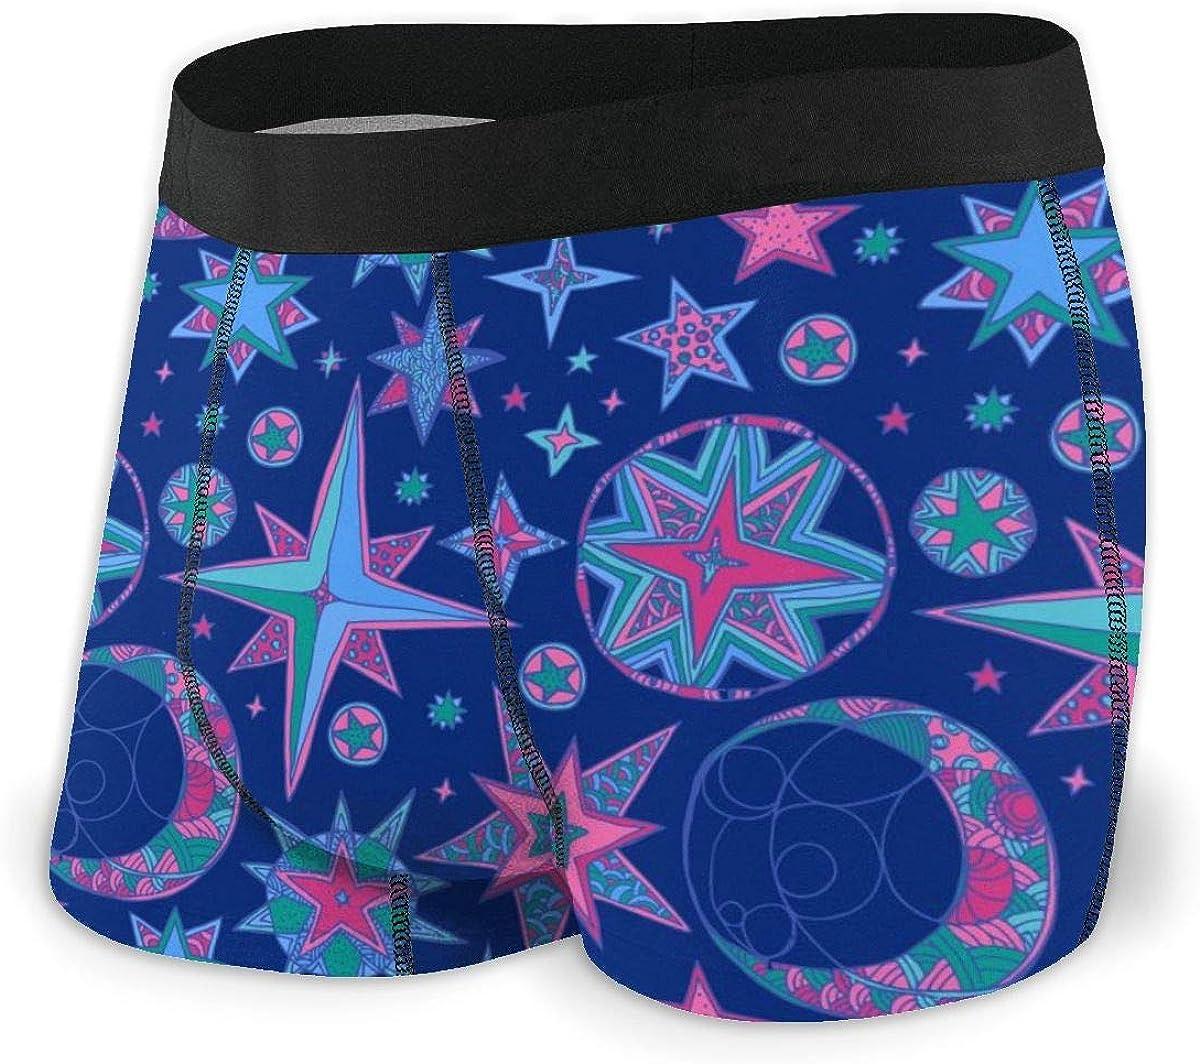 Randolph Wordsworth Mens Boxer Briefs Paisley Star Moon Nave Blue Low Rise Trunks Breathable Bikini Underpants Boys Underwear